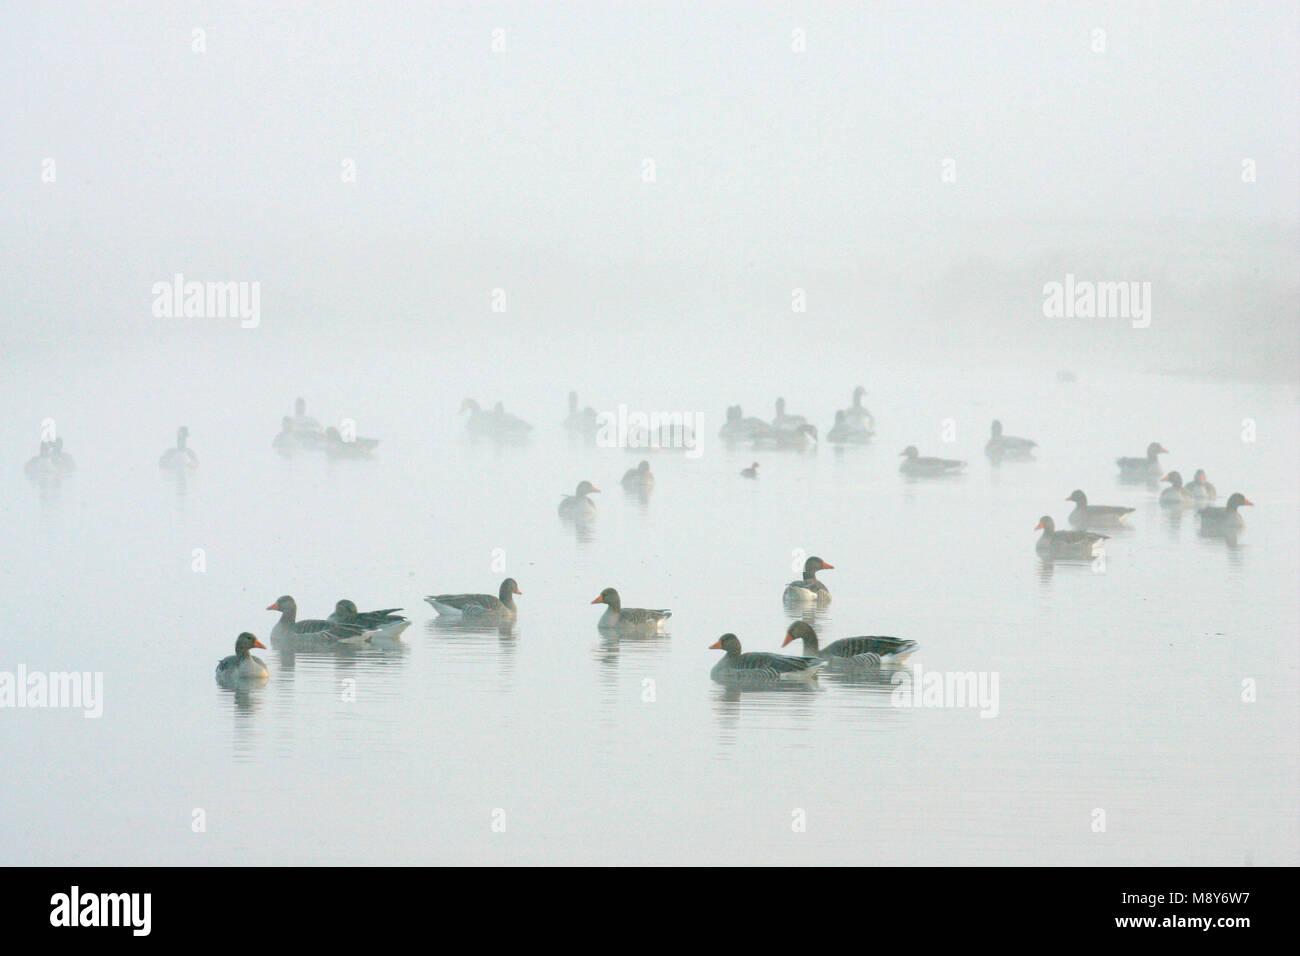 Grauwe Gans groep in water met mist; Grey-lag Goose group perched in water with fog Stock Photo